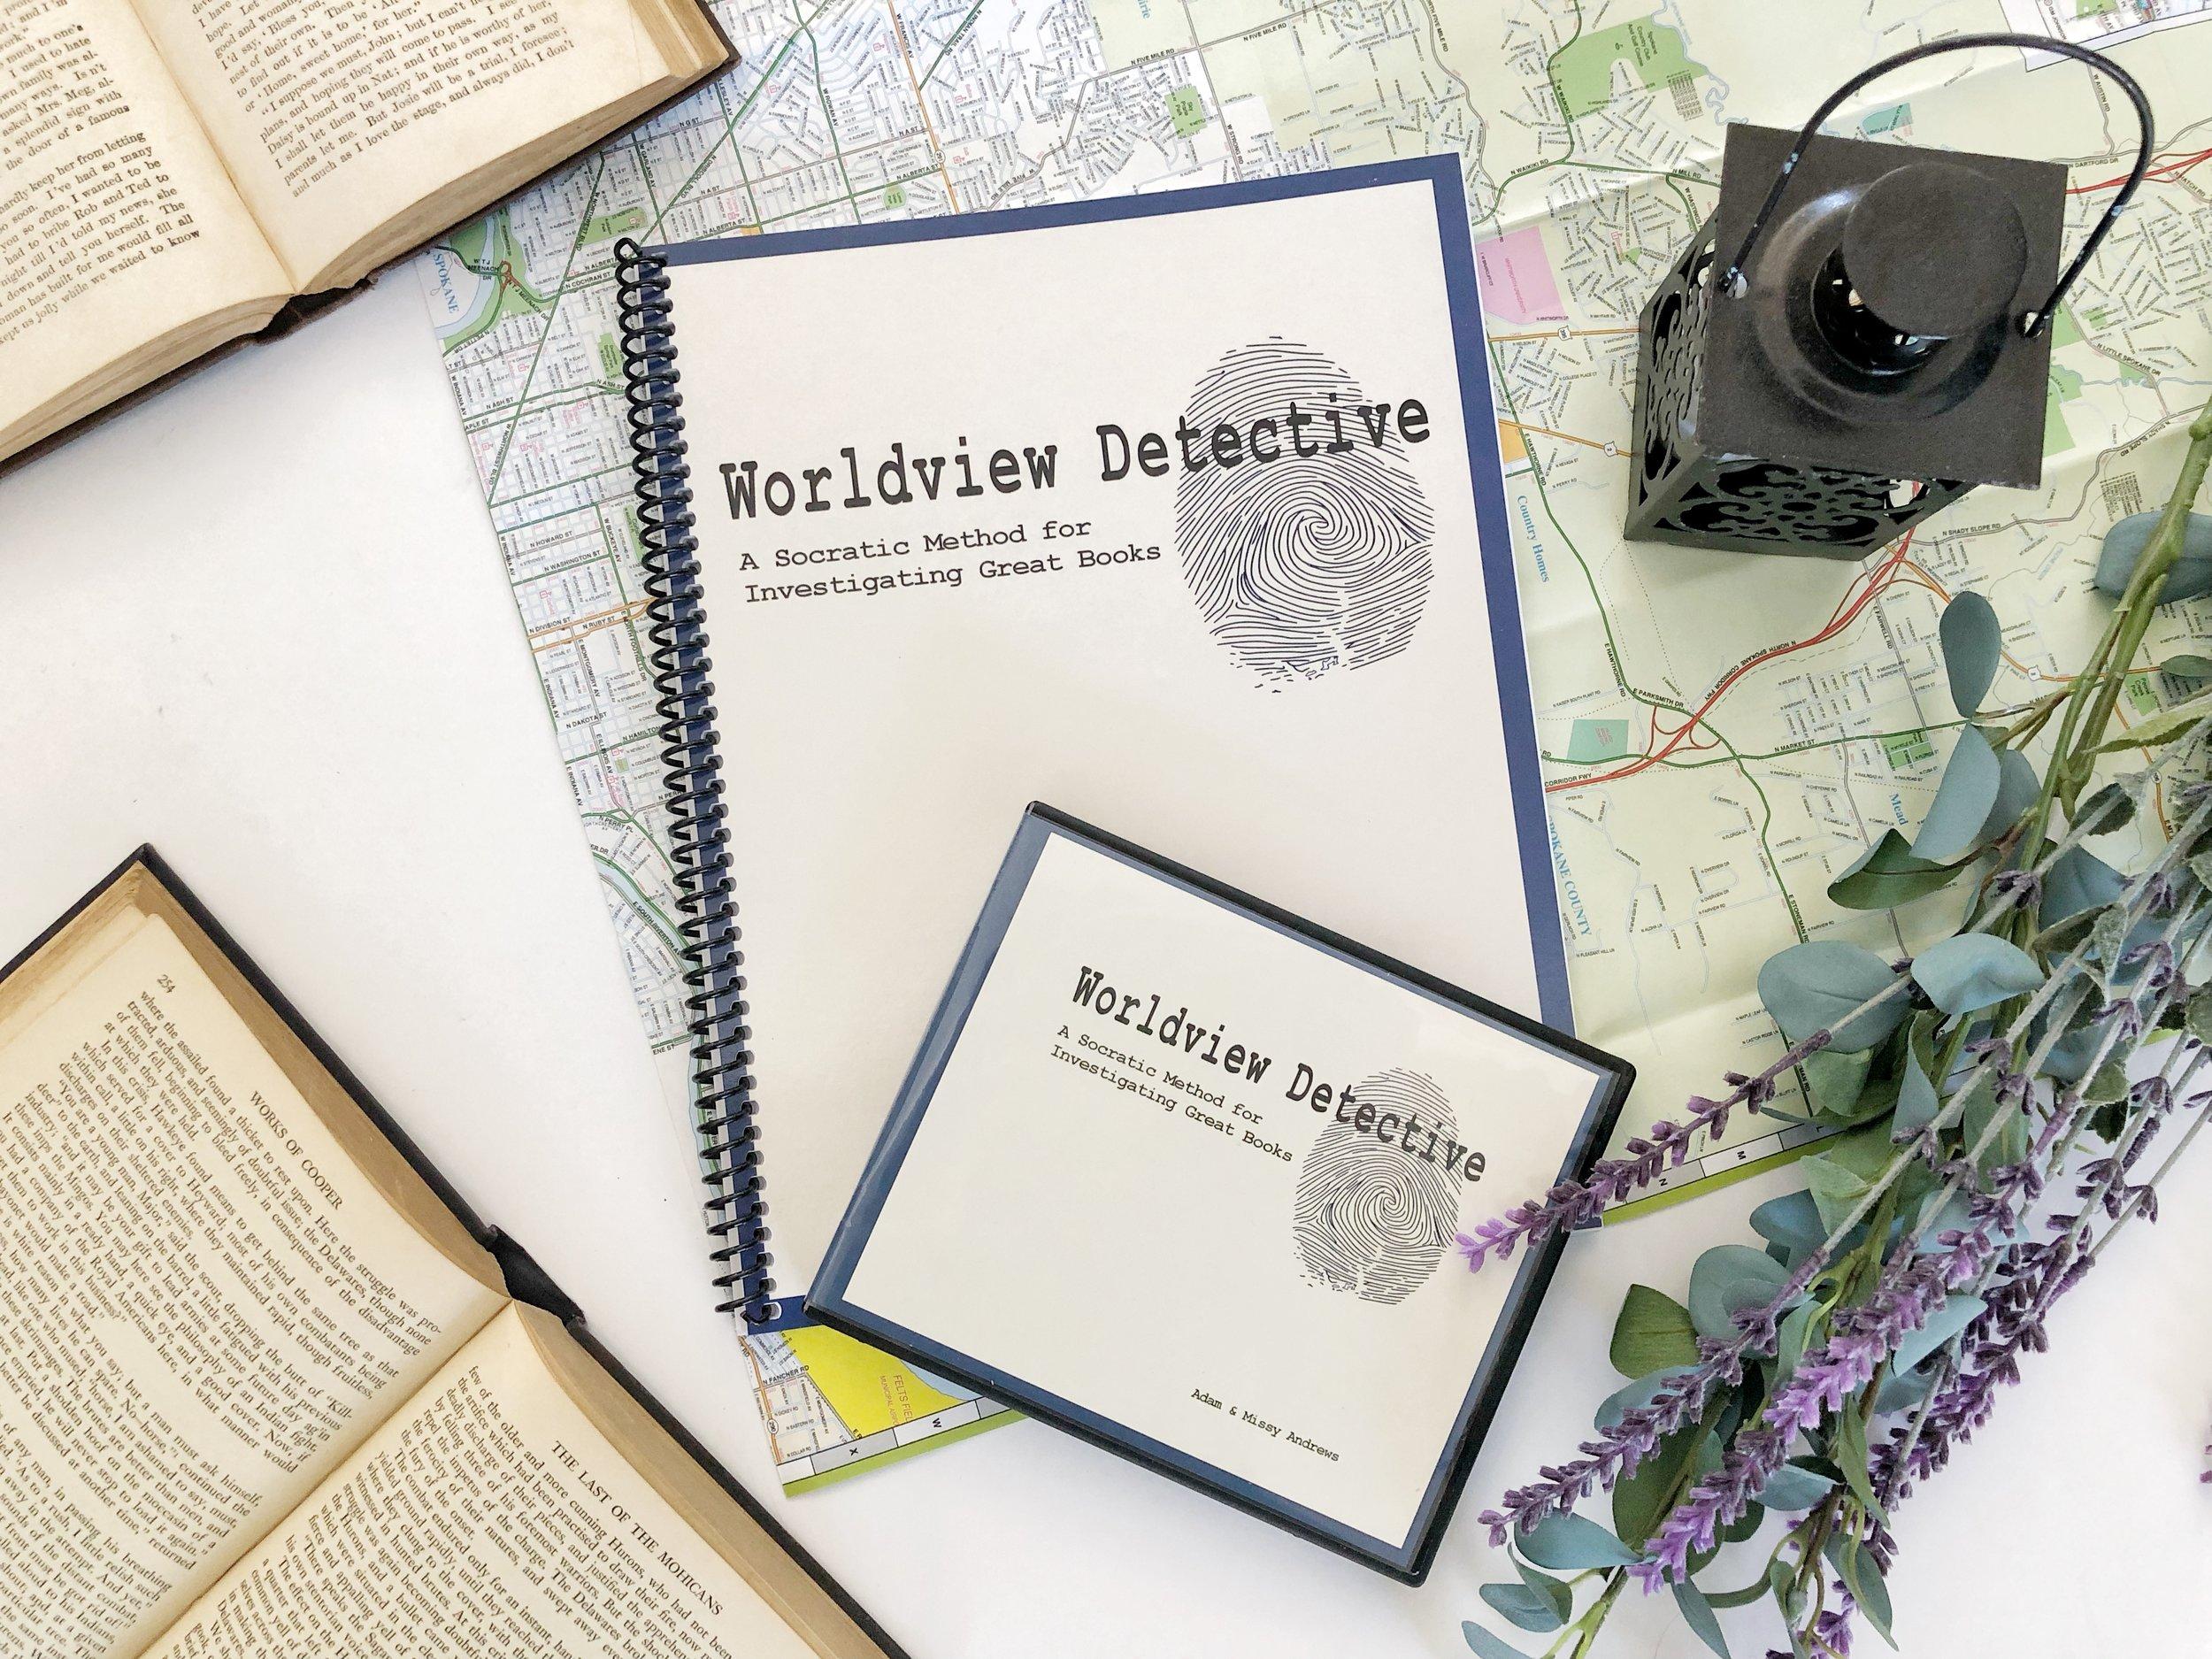 Vendor Image #2 Worldview Detective.jpg